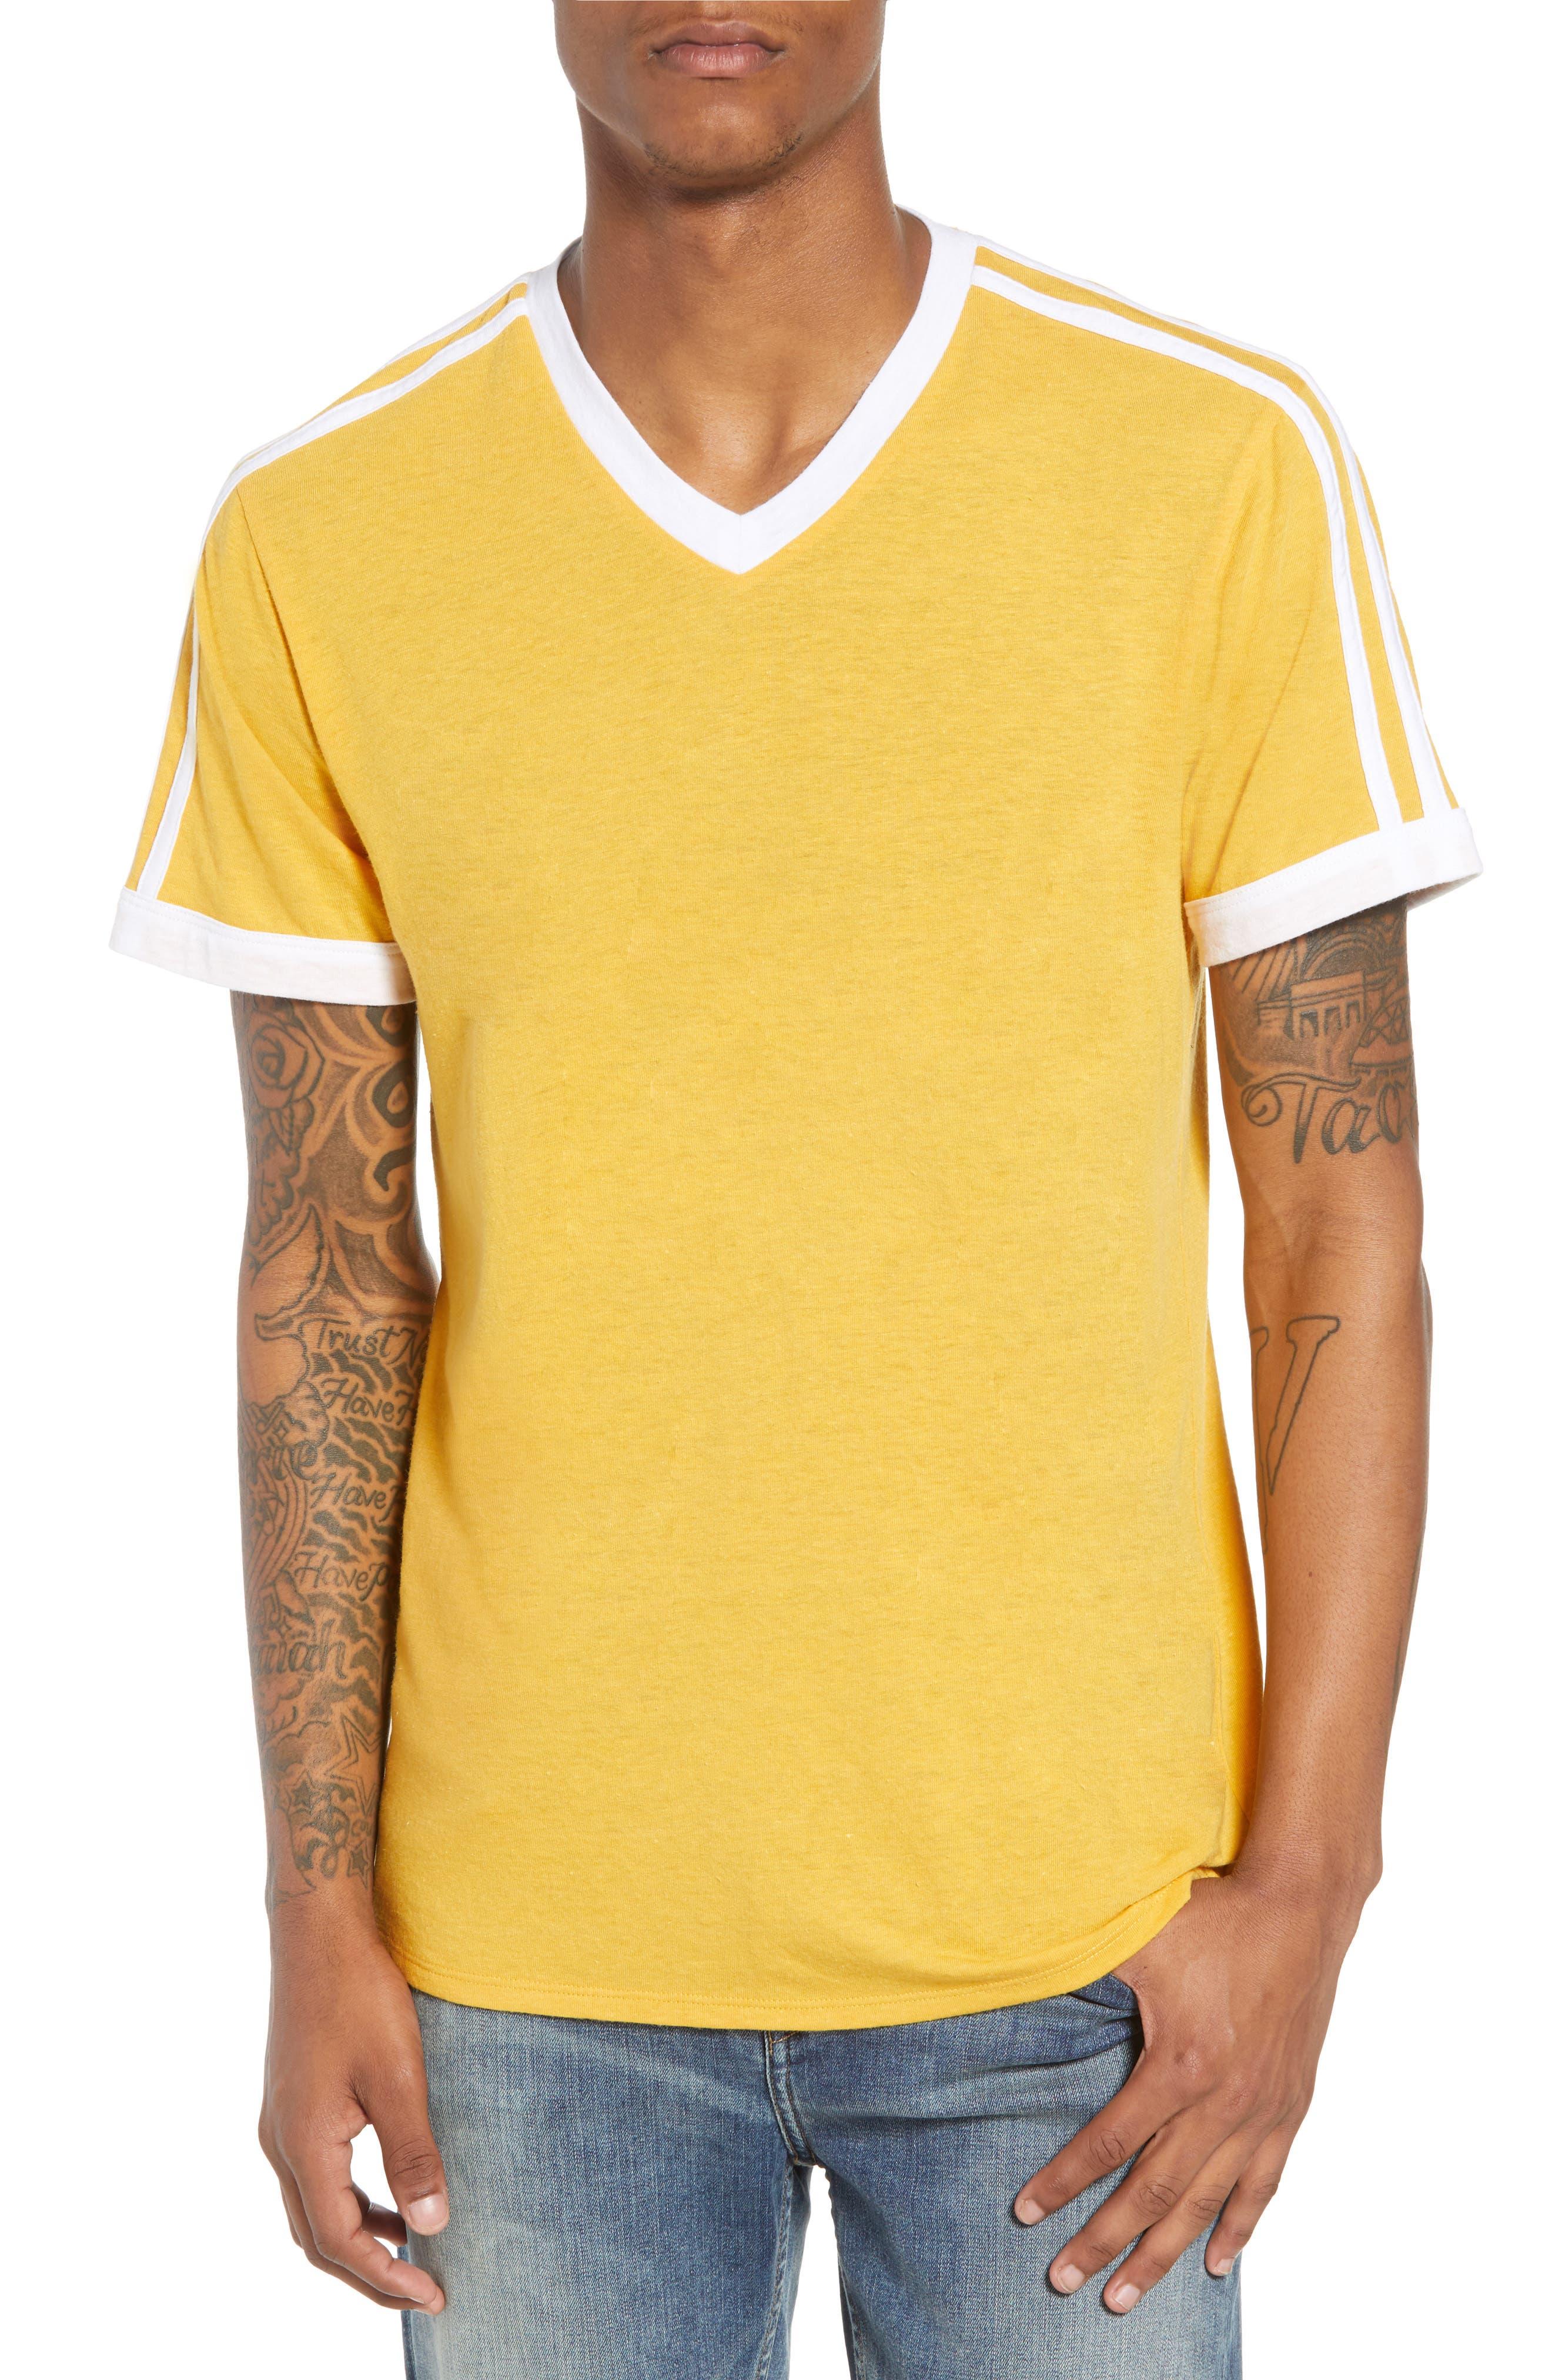 Vintage Athletic V-Neck T-Shirt,                             Main thumbnail 1, color,                             Yellow Mineral / White Stripe